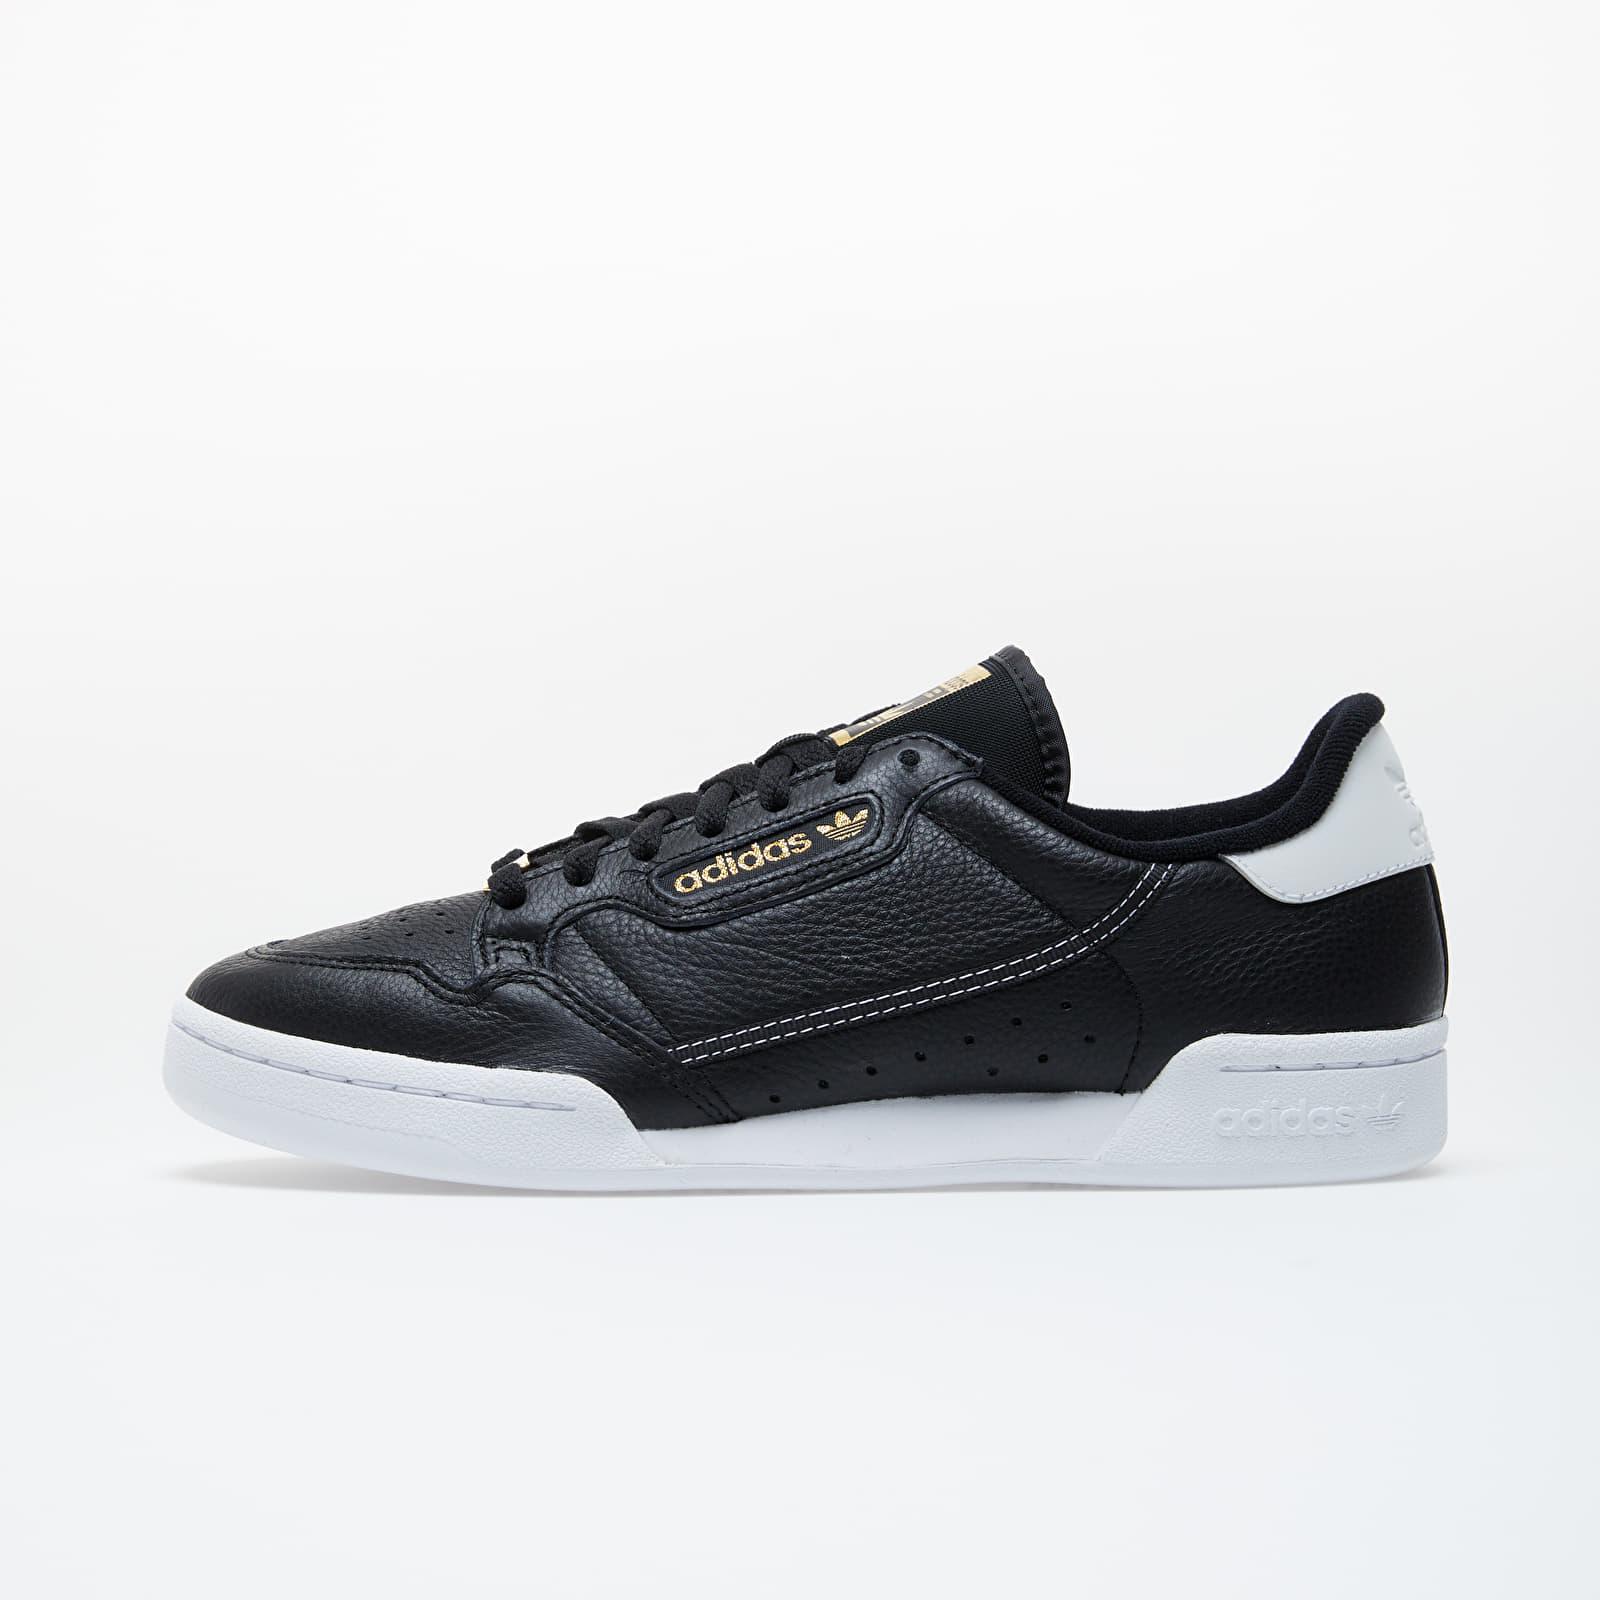 Pánské tenisky a boty adidas Continental 80 Core Black/ Core Black/ Ftw White